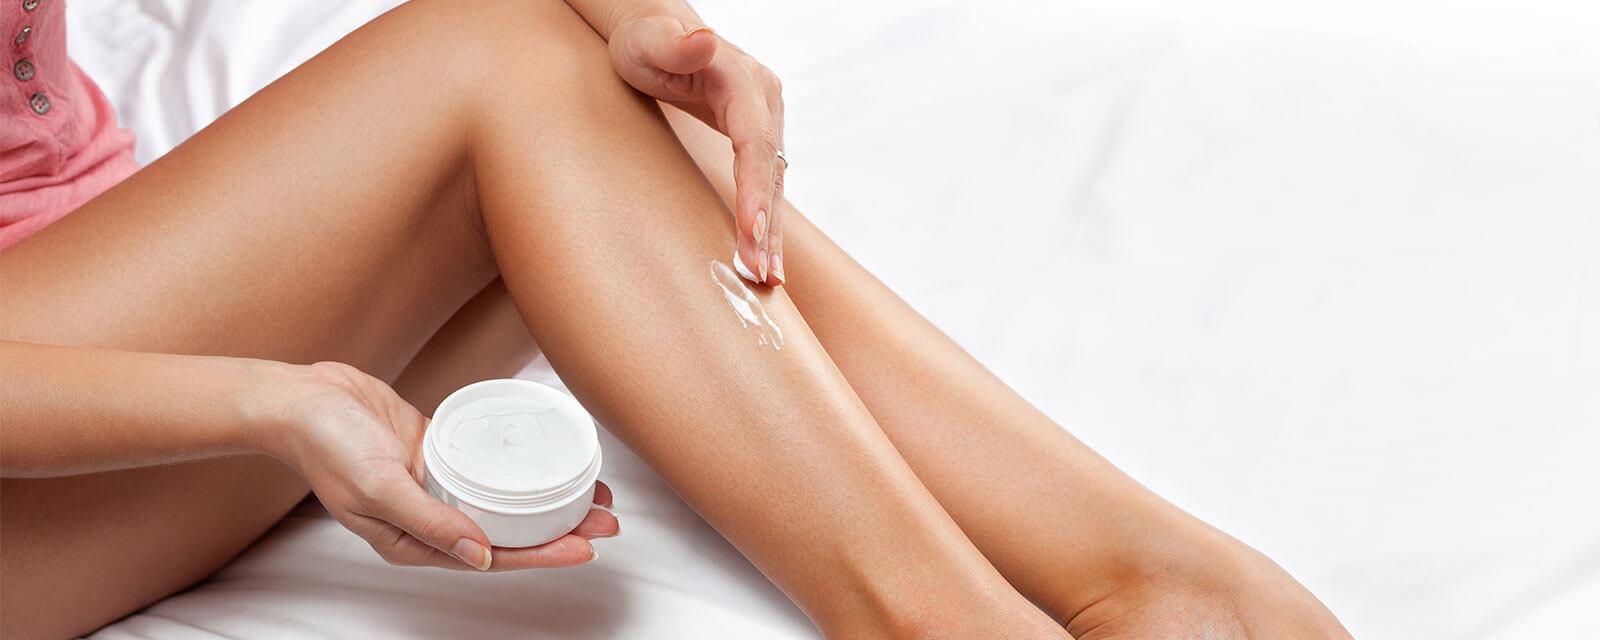 Prevention of varicose veins 67